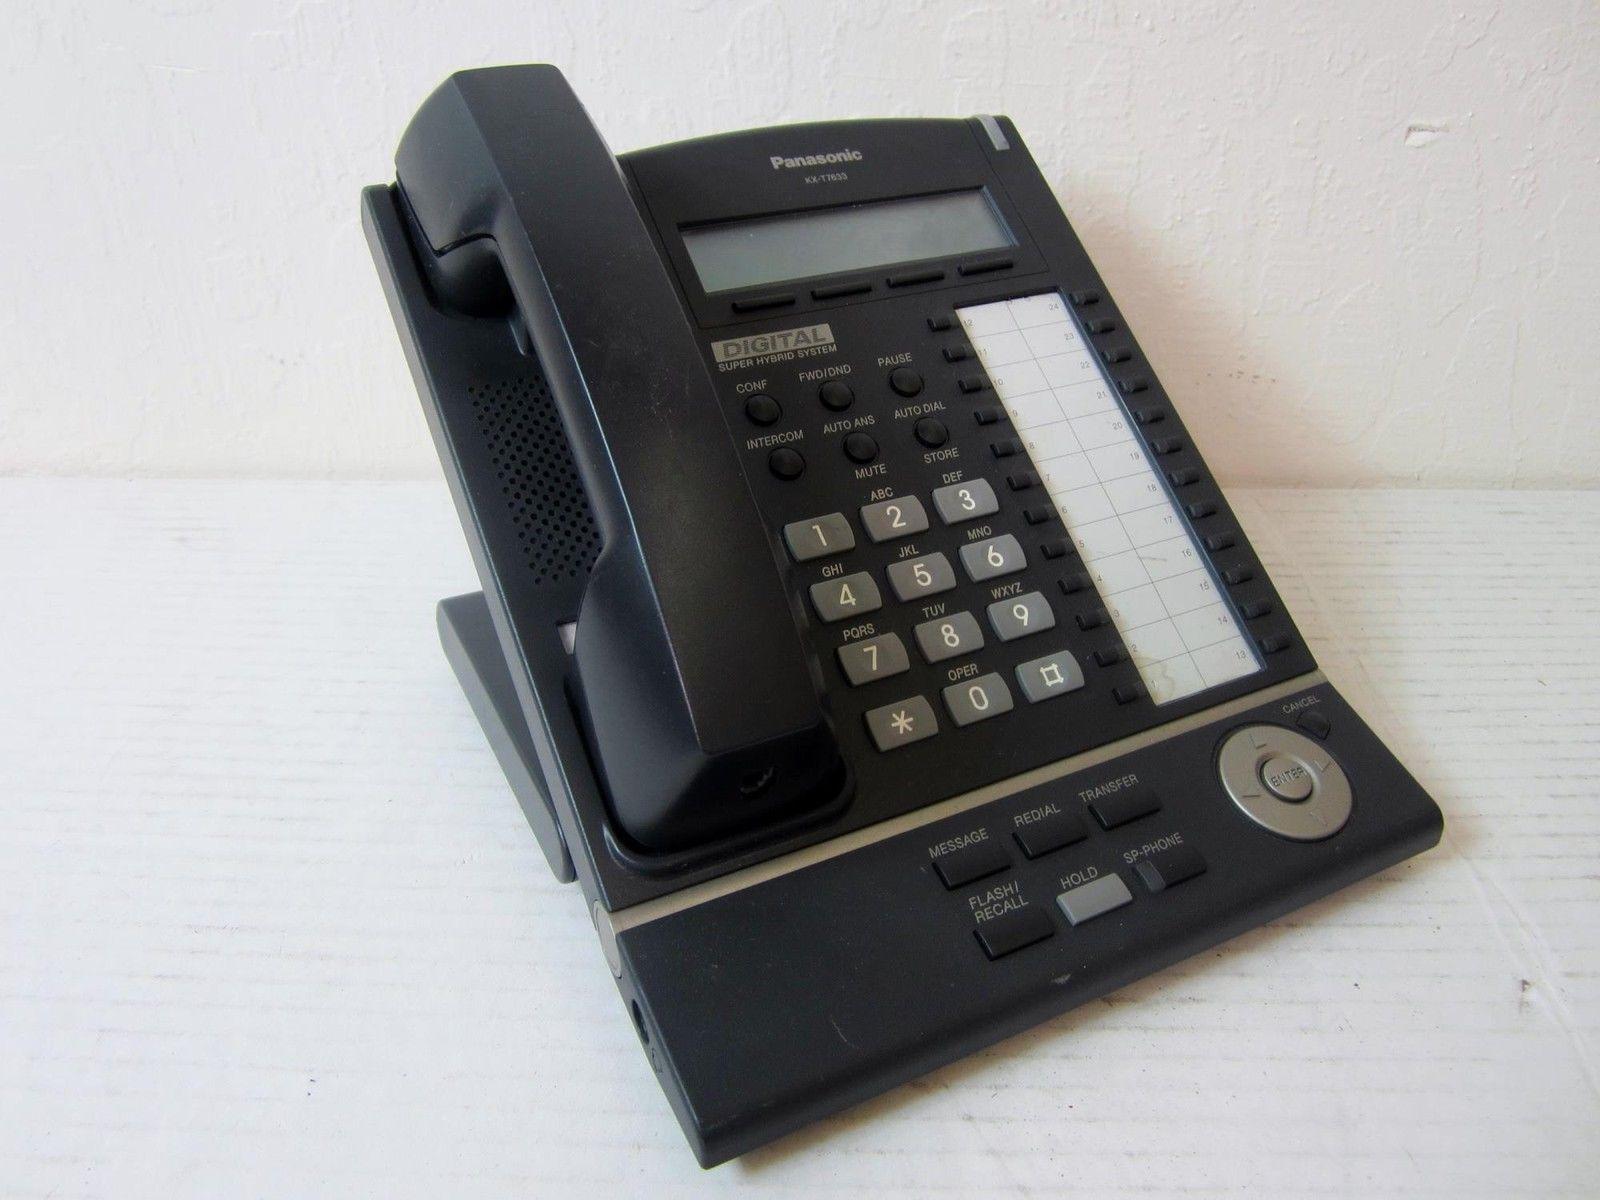 panasonic kx t7633 b digital telephone and 33 similar items rh bonanza com Panasonic Kx T7633 Change Name Panasonic KX-T7633 Hang